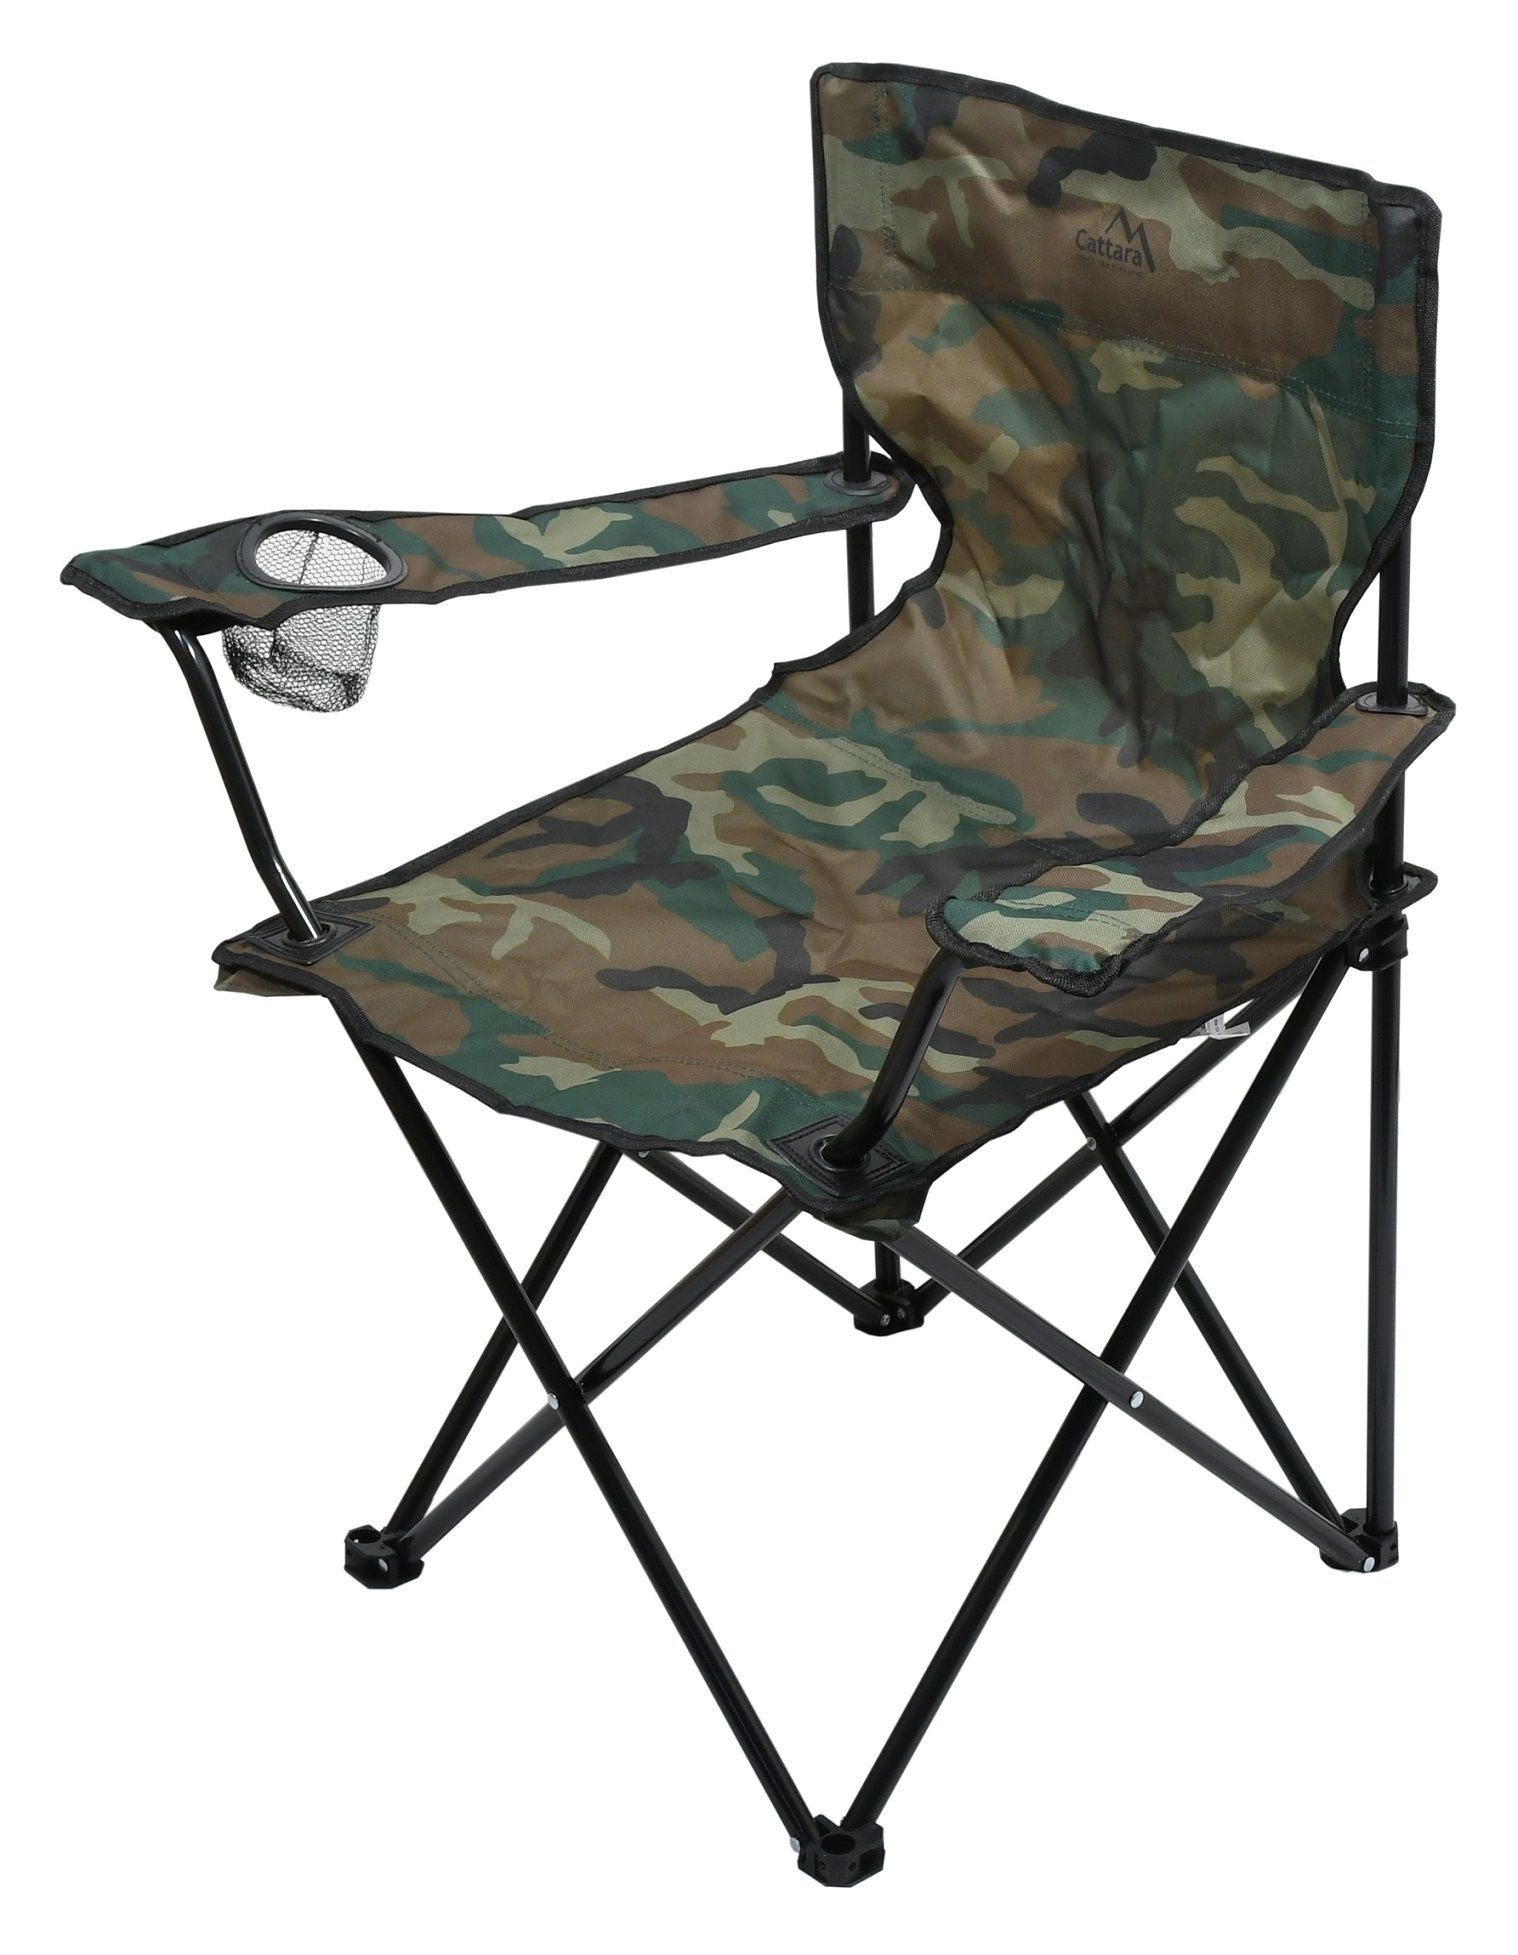 Židle kempingová skládací BARI ARMY CATTARA